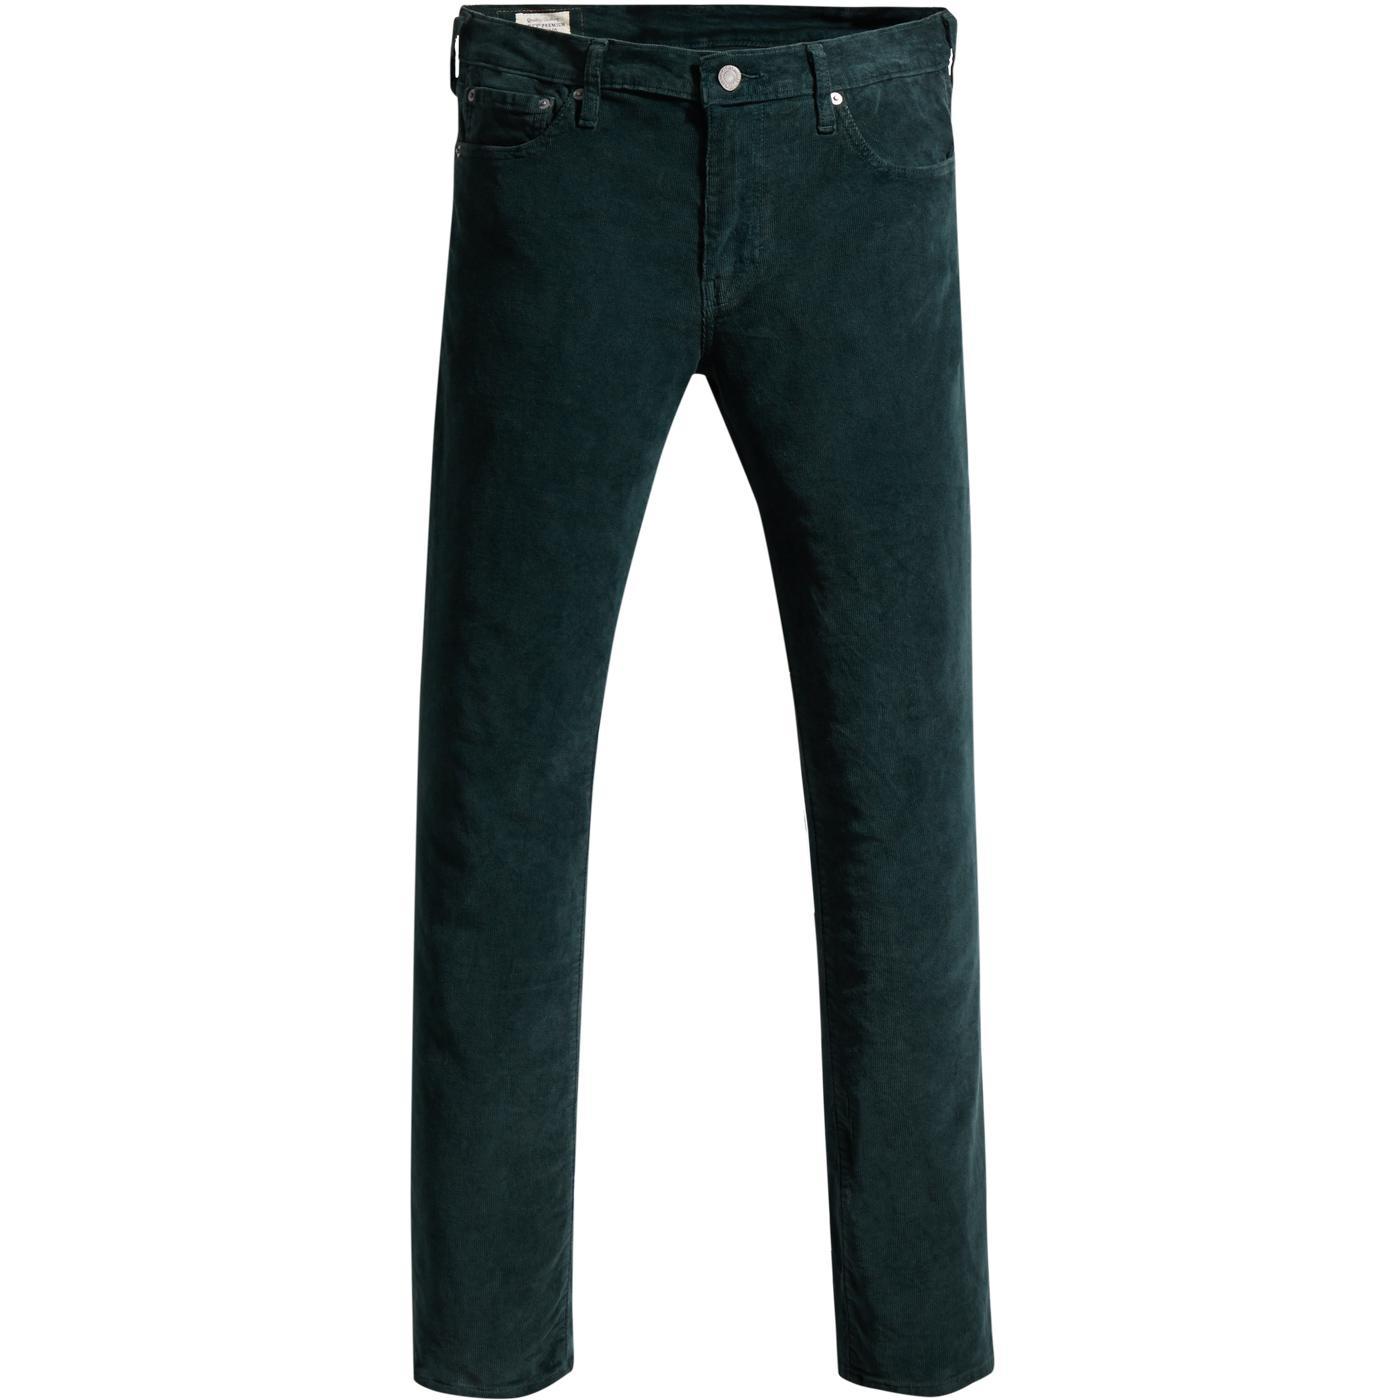 LEVI'S 511 Retro Mod Slim 14W Cord Trousers (SG)